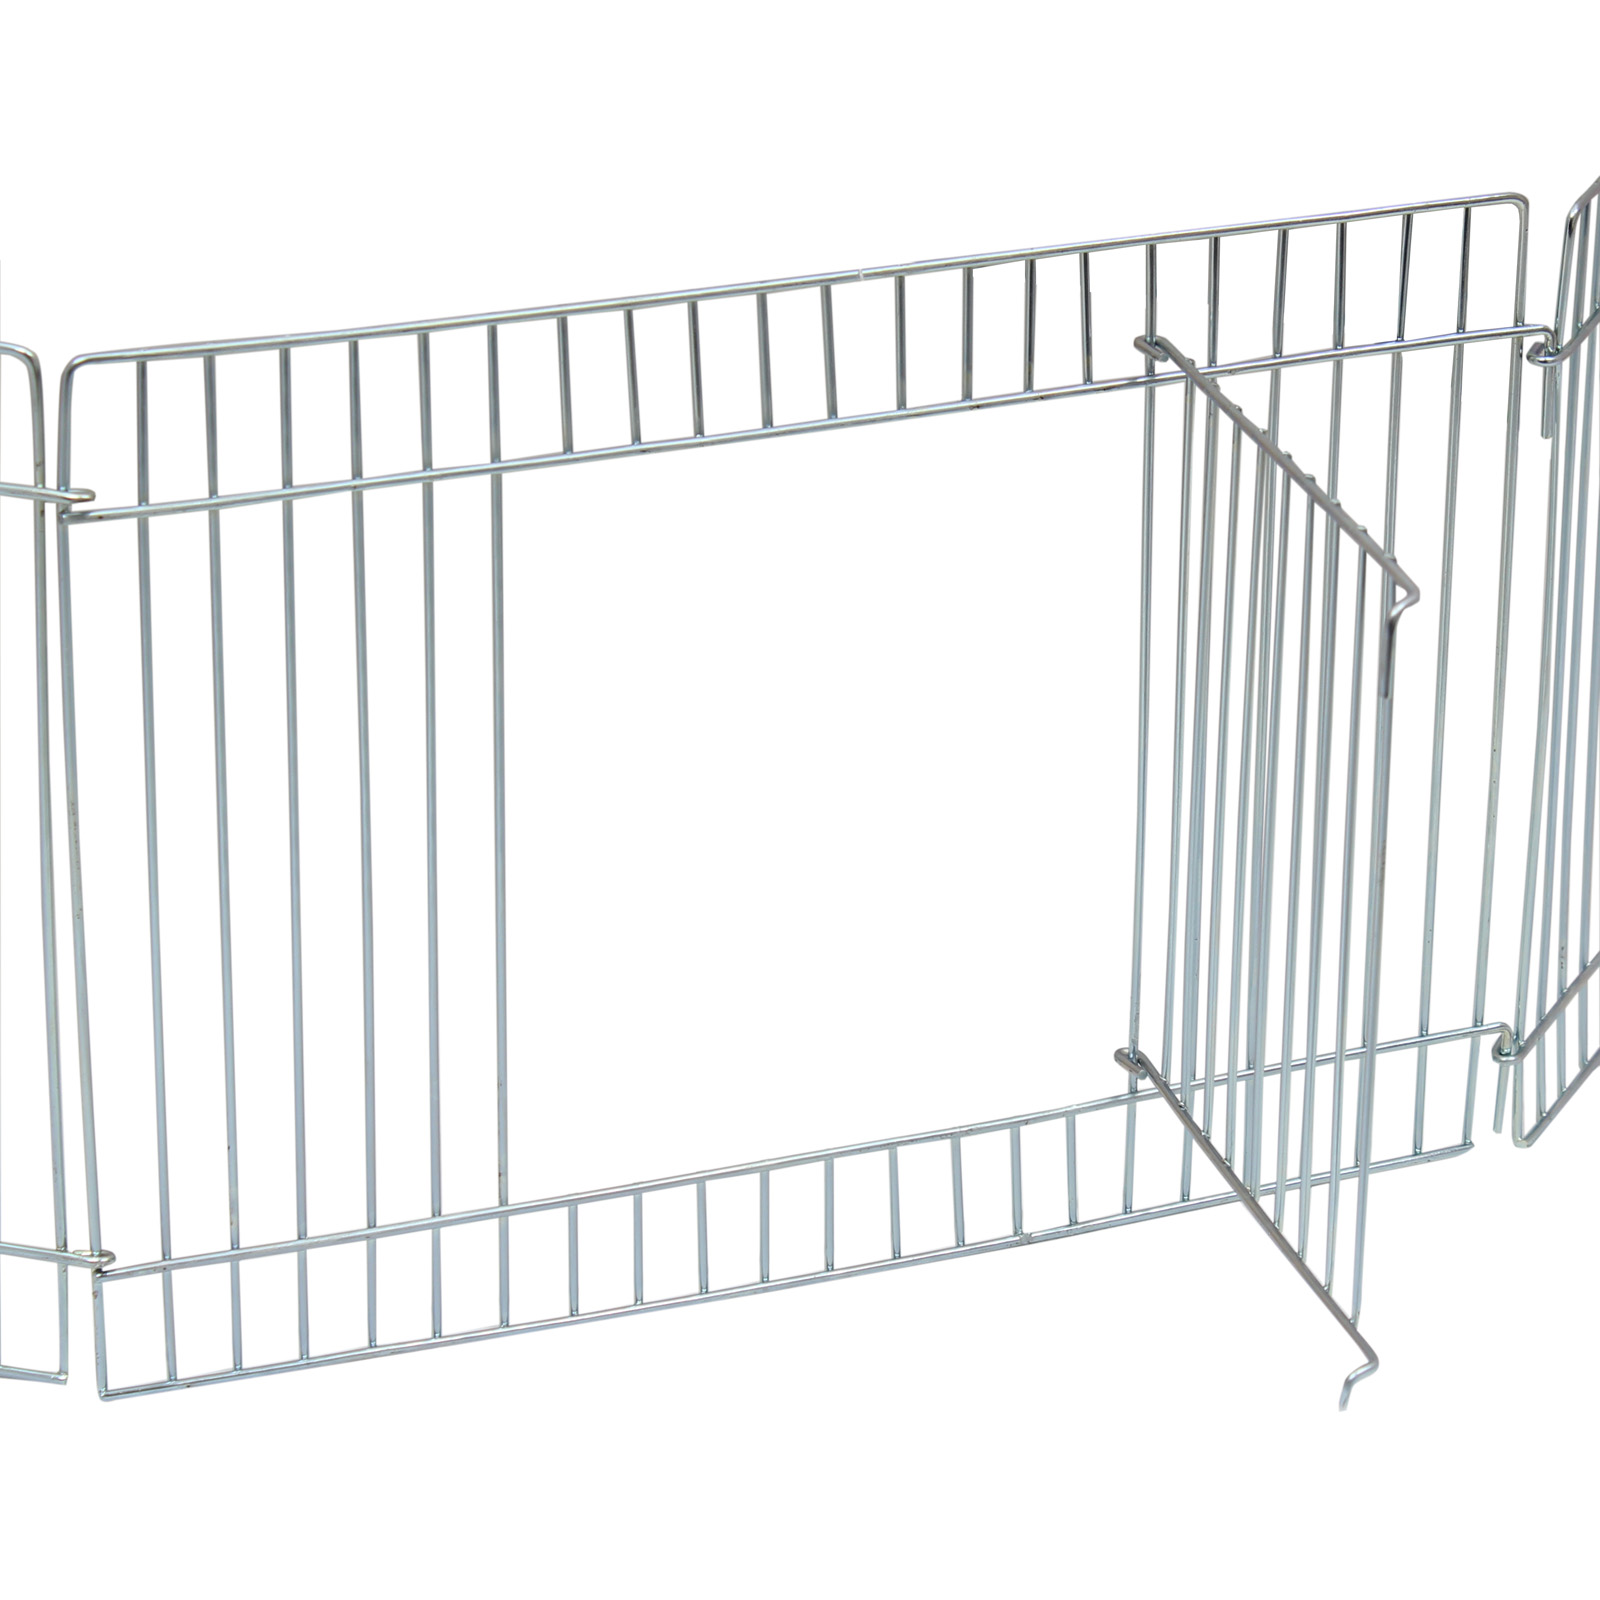 Me Amp My Small Pet Playpen Cage Amp Floor Mat Rabbit Guinea